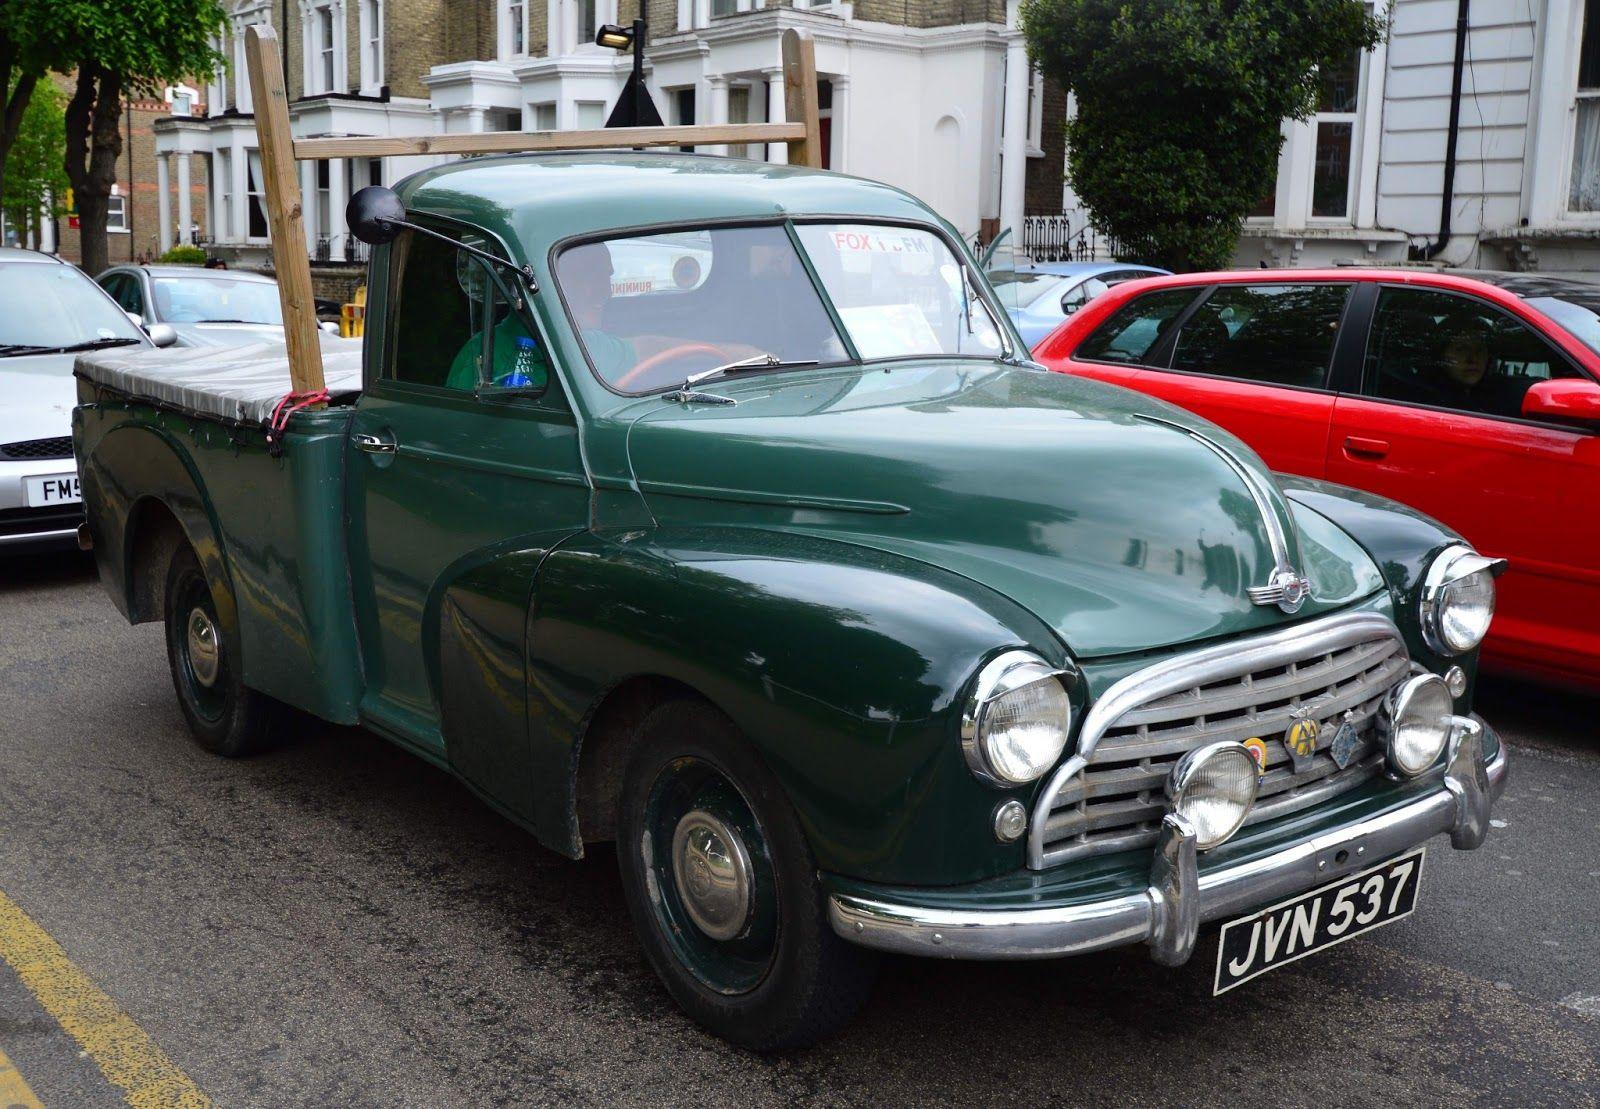 morris oxford pickup - Google Search | 1950s Cars | Pinterest ...